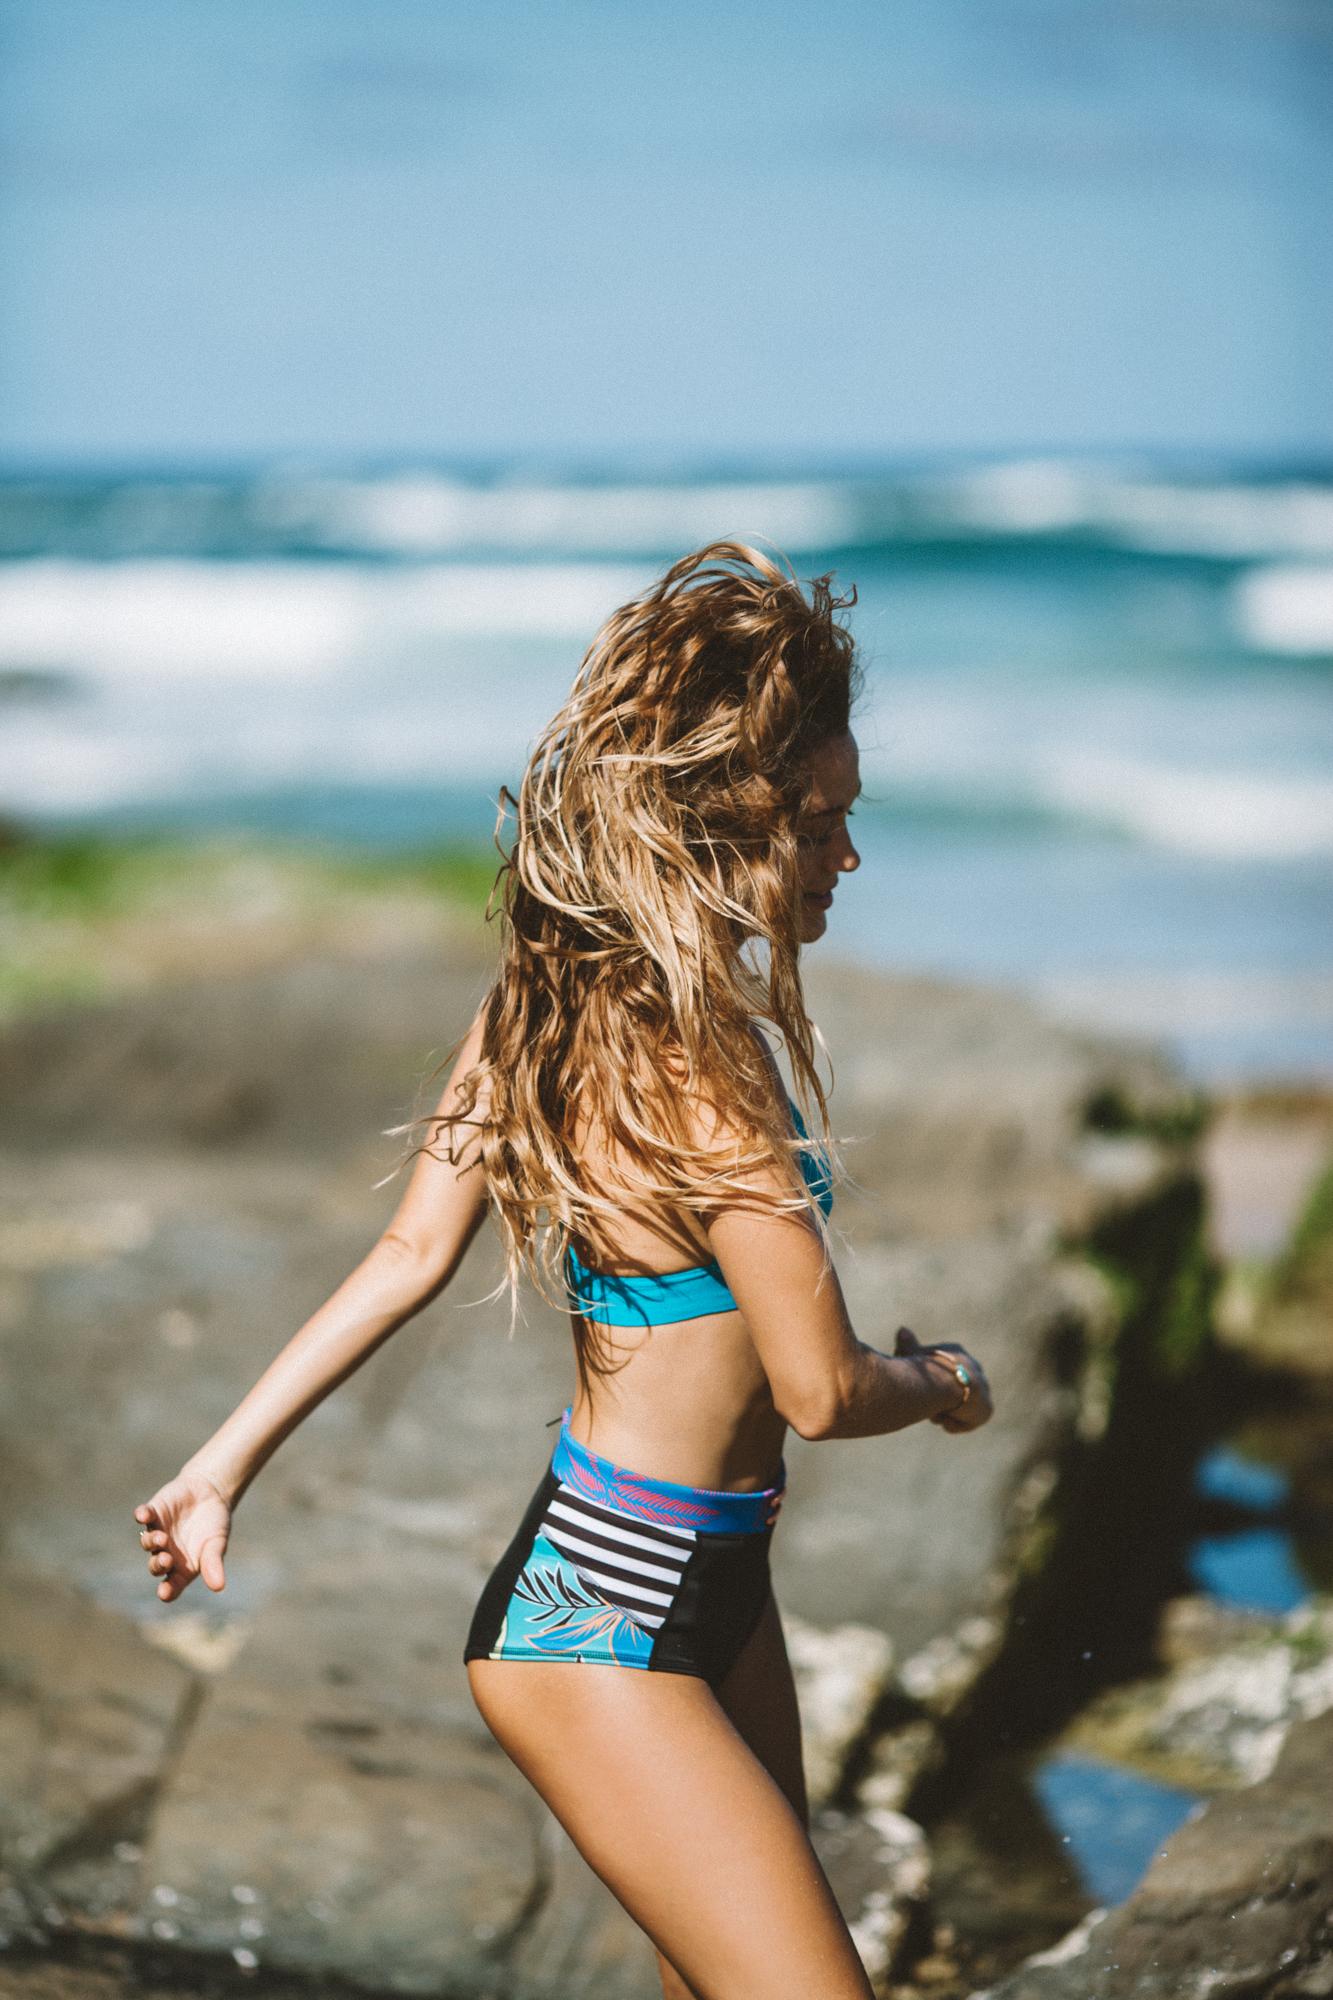 Roxy X Summersite_FINALS_web-7285.jpg